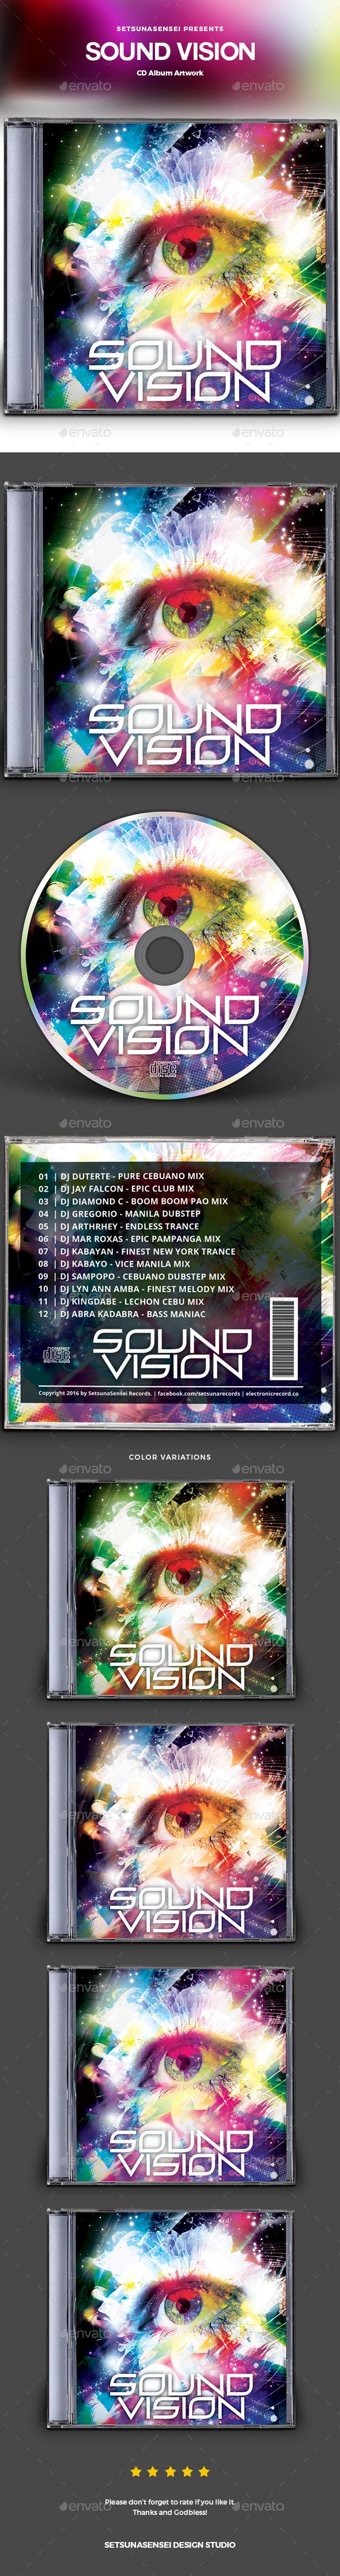 Sound Vision CD Album Artwork - CD & DVD Artwork Print Templates